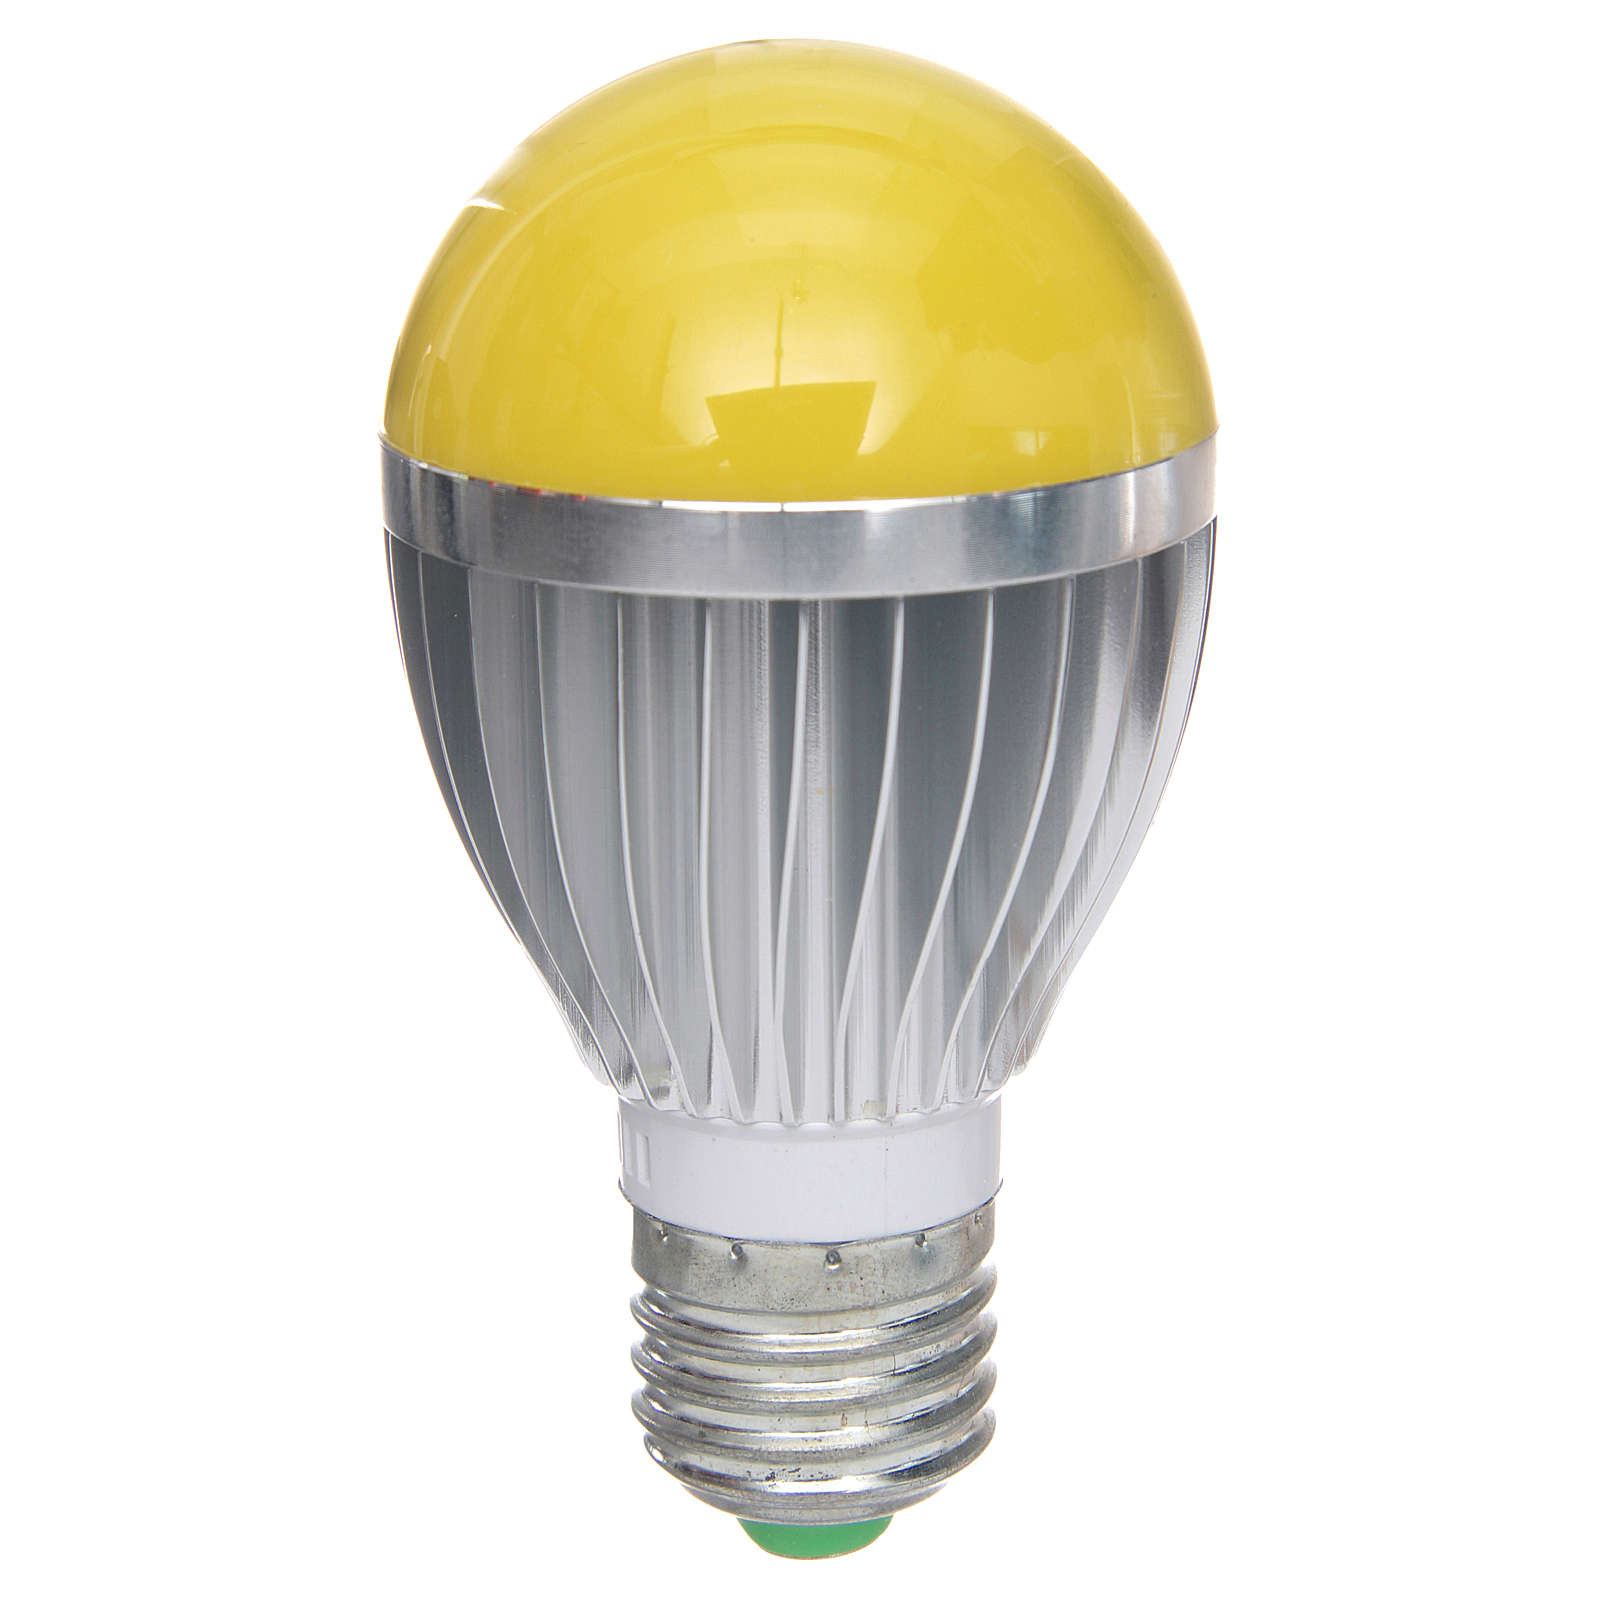 Lampada a led 5W dimmerabile gialla presepe 4